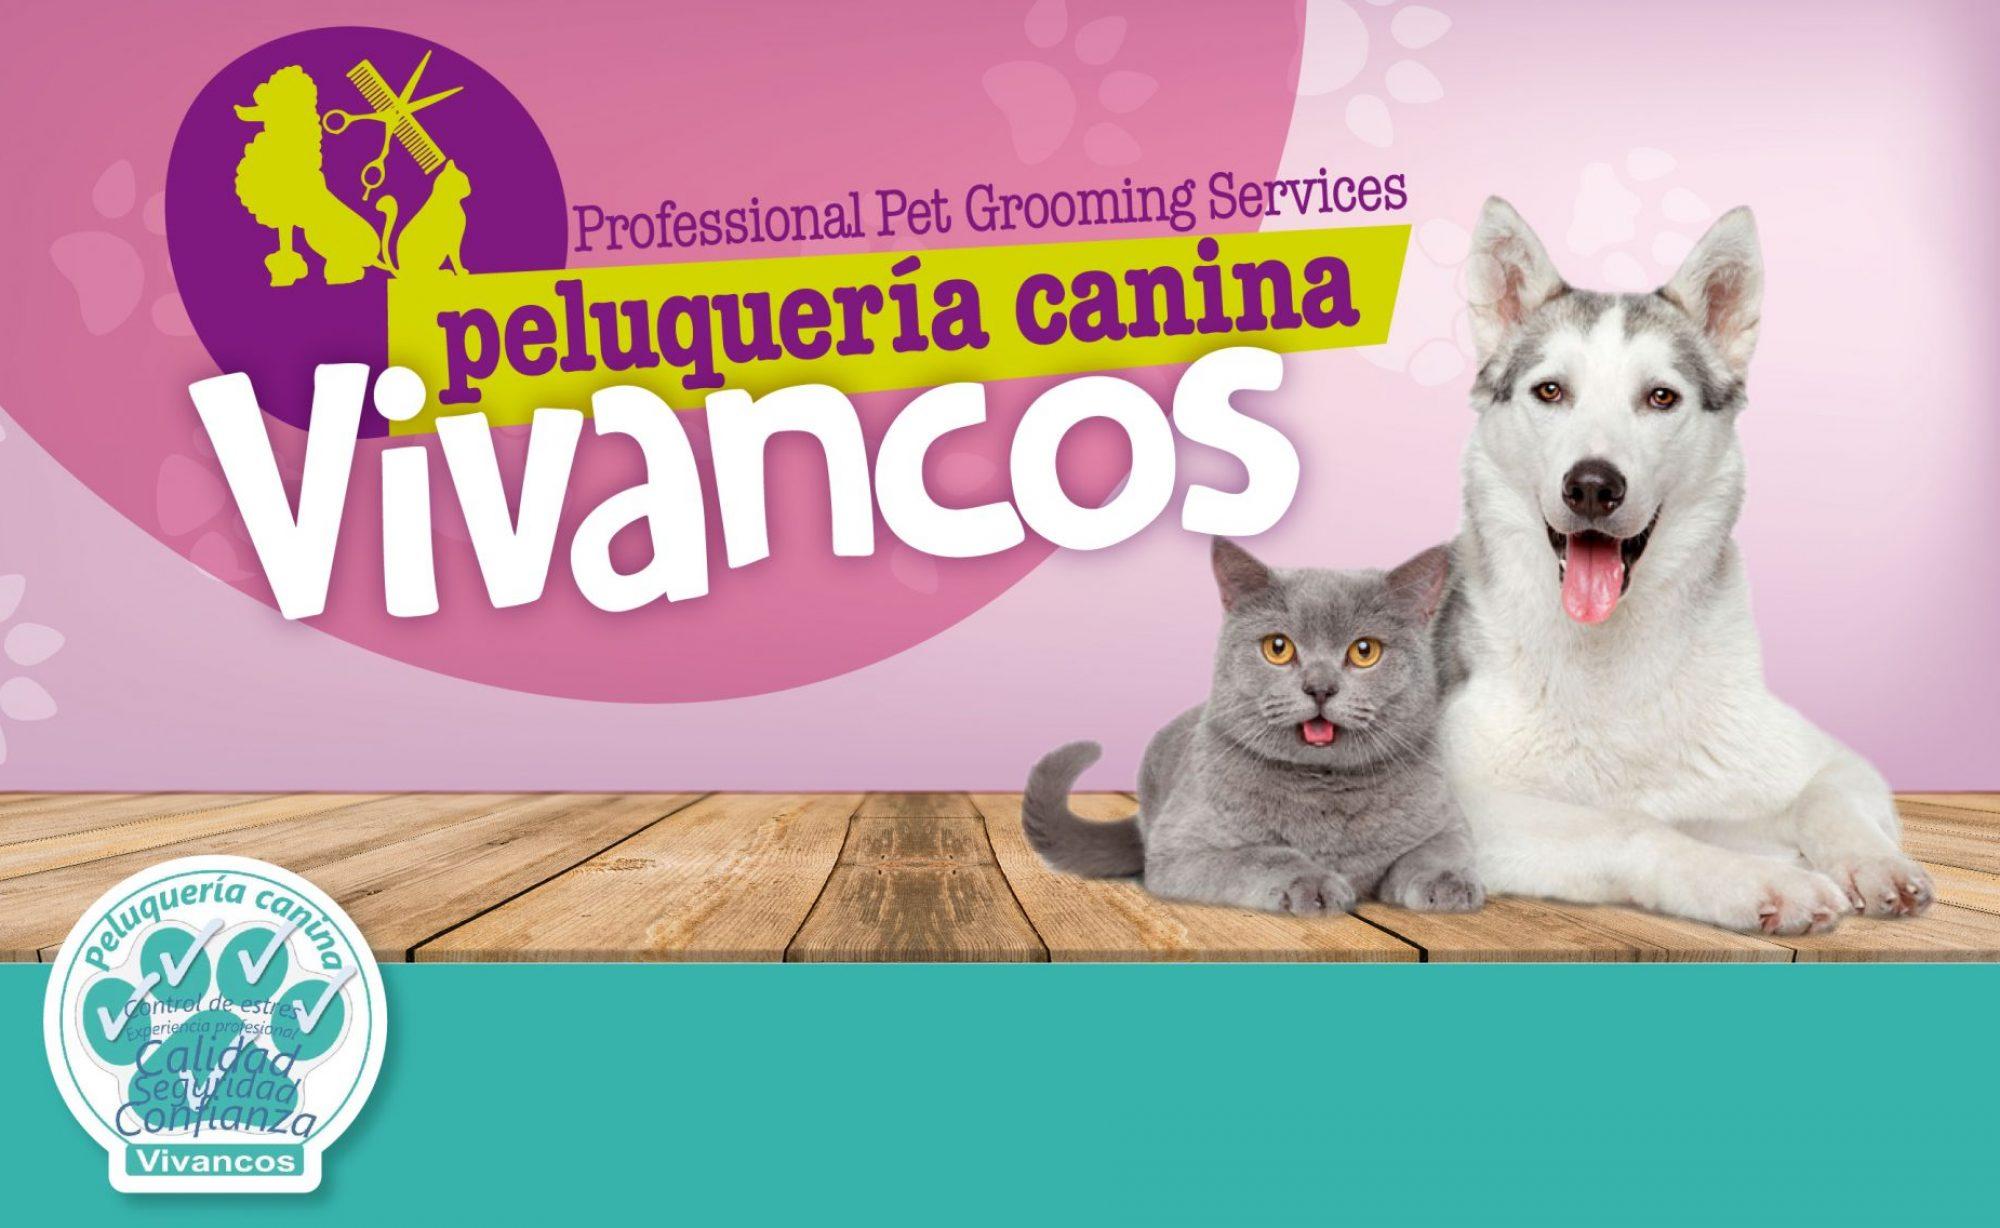 Peluquería Canina Vivancos